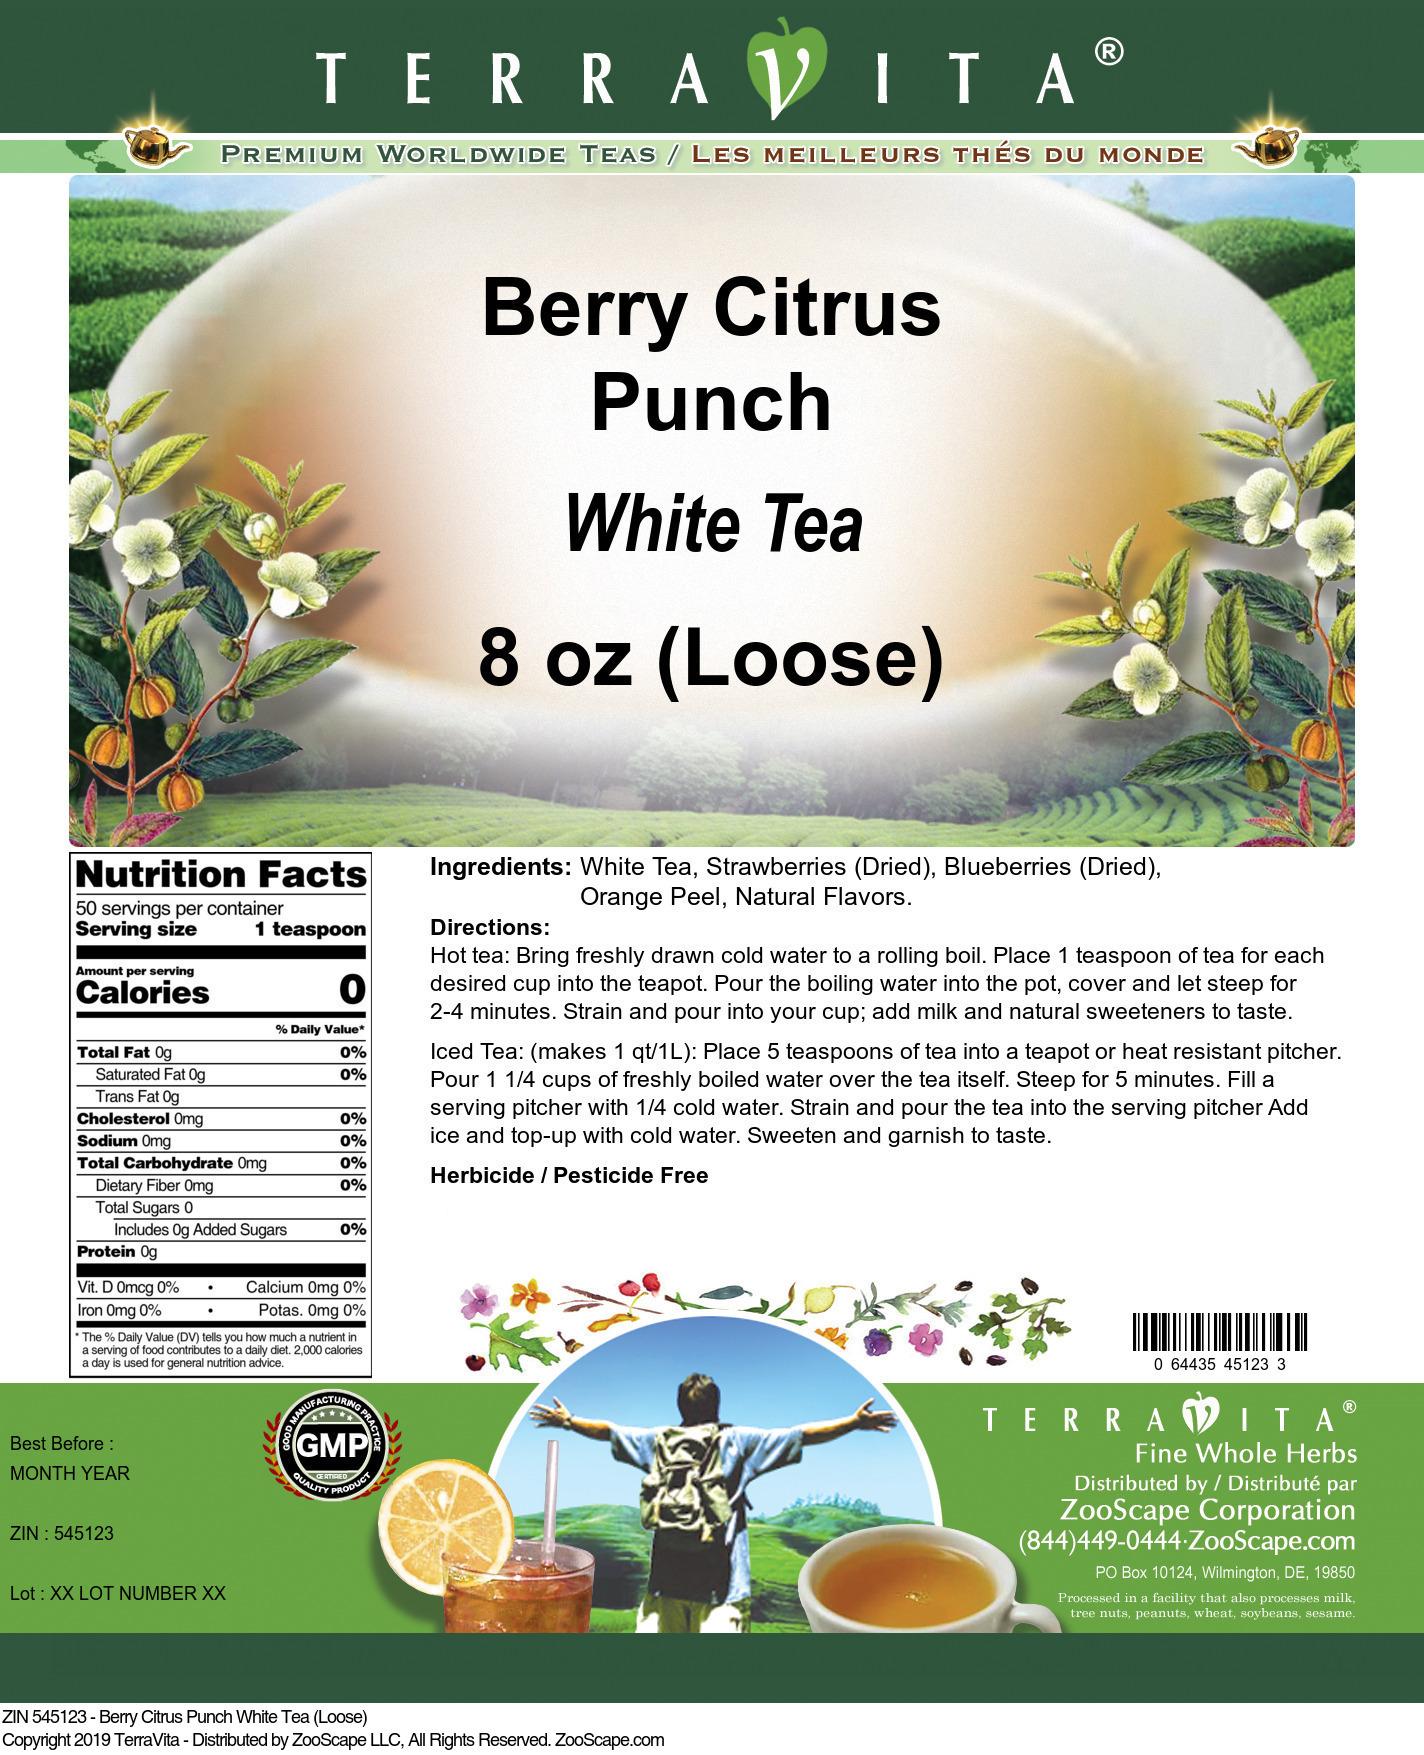 Berry Citrus Punch White Tea